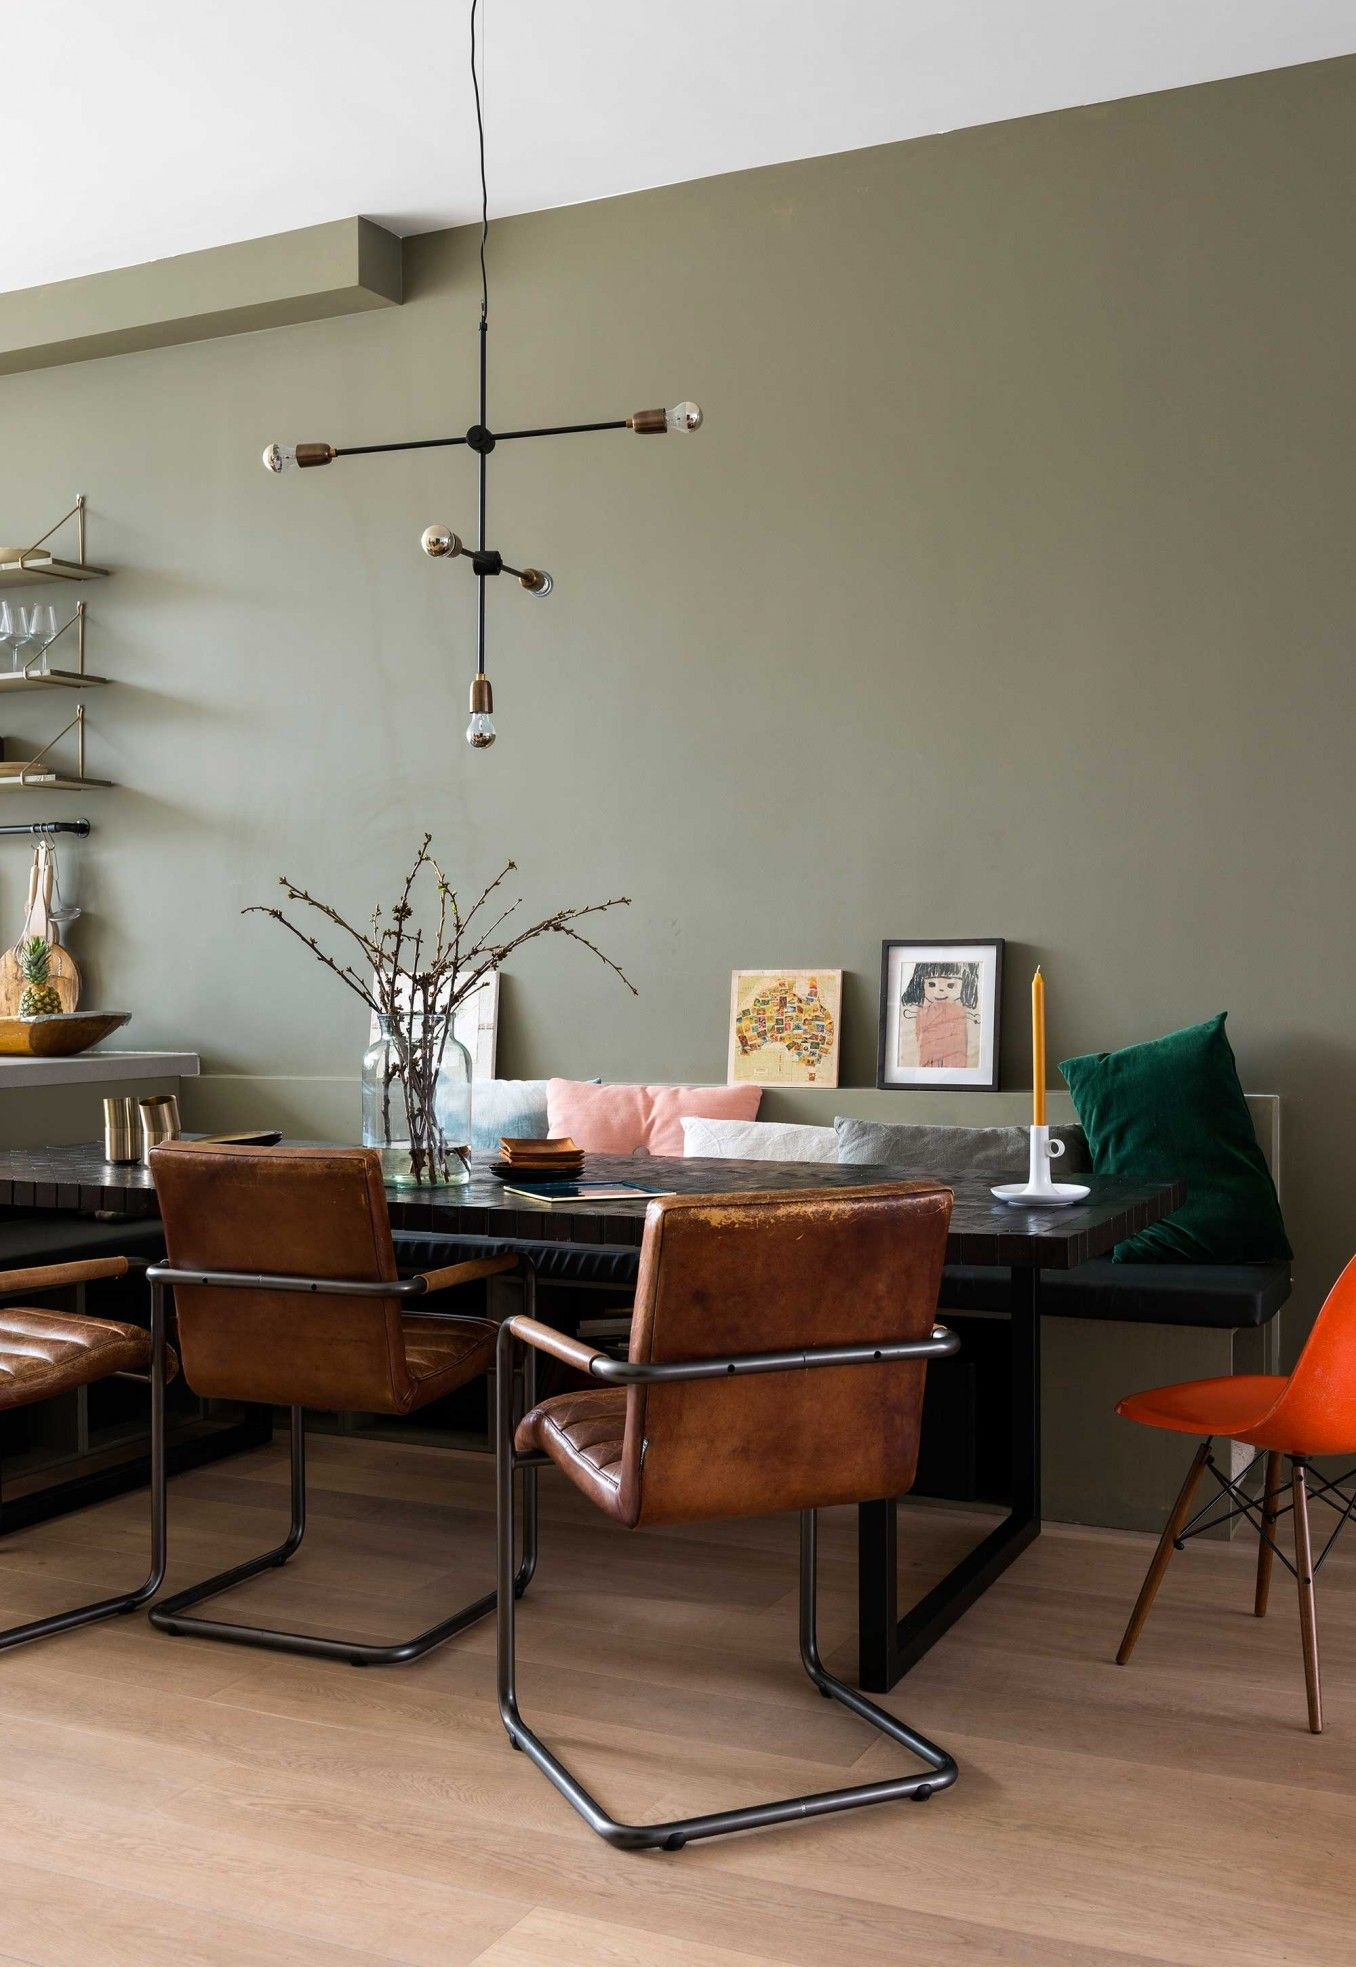 6 groene wand eethoek interieur pinterest wandfarbe wohnideen und einrichtung. Black Bedroom Furniture Sets. Home Design Ideas